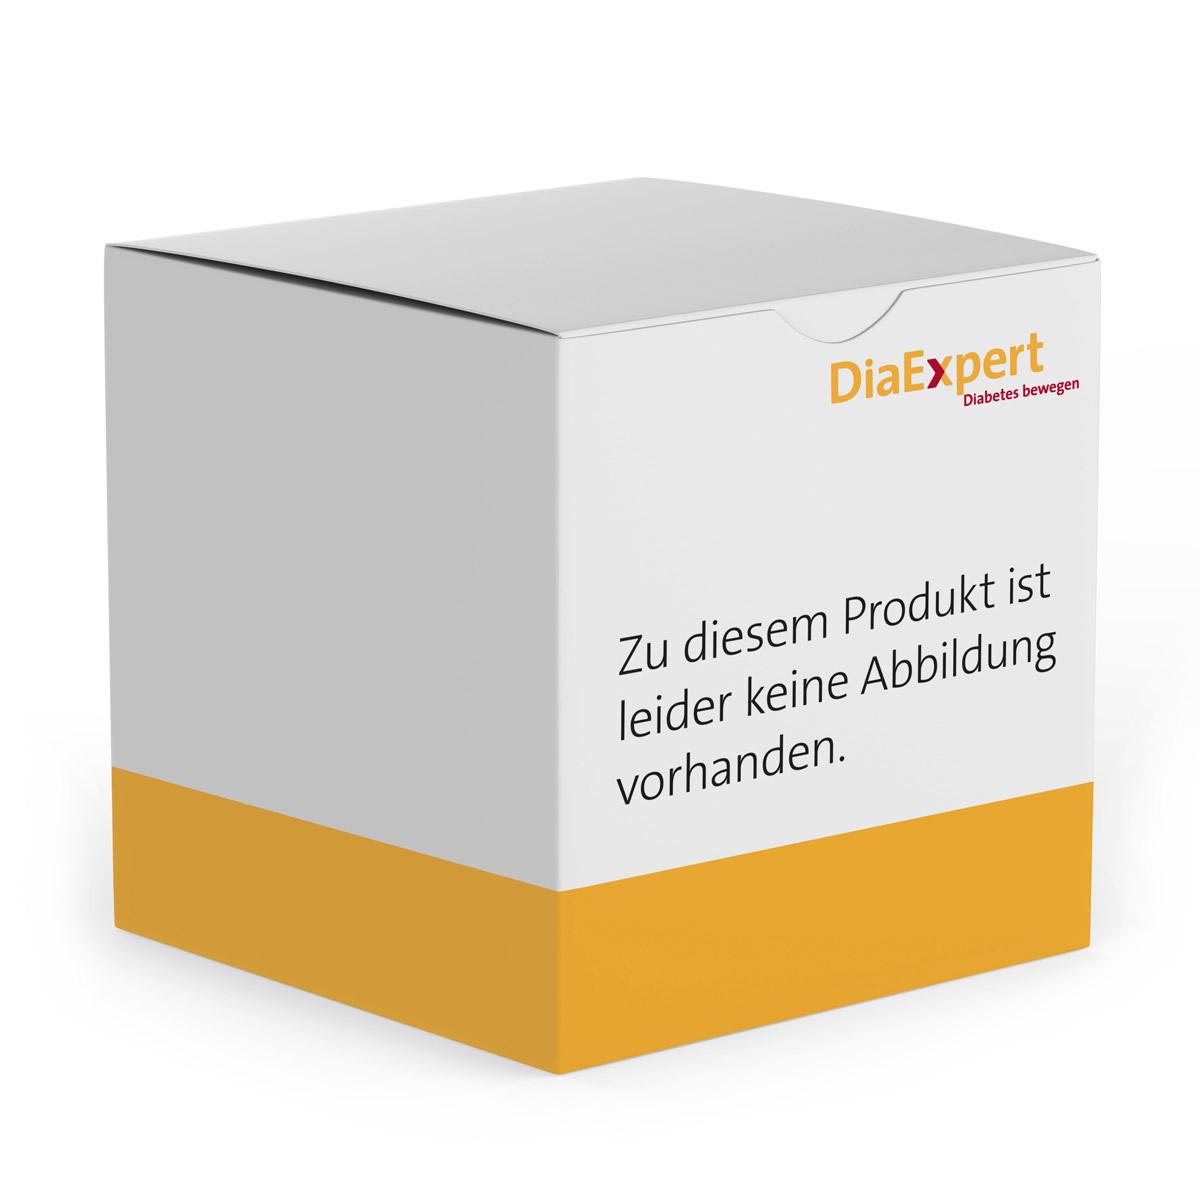 GlucoMen areo 2K Set mg/dL